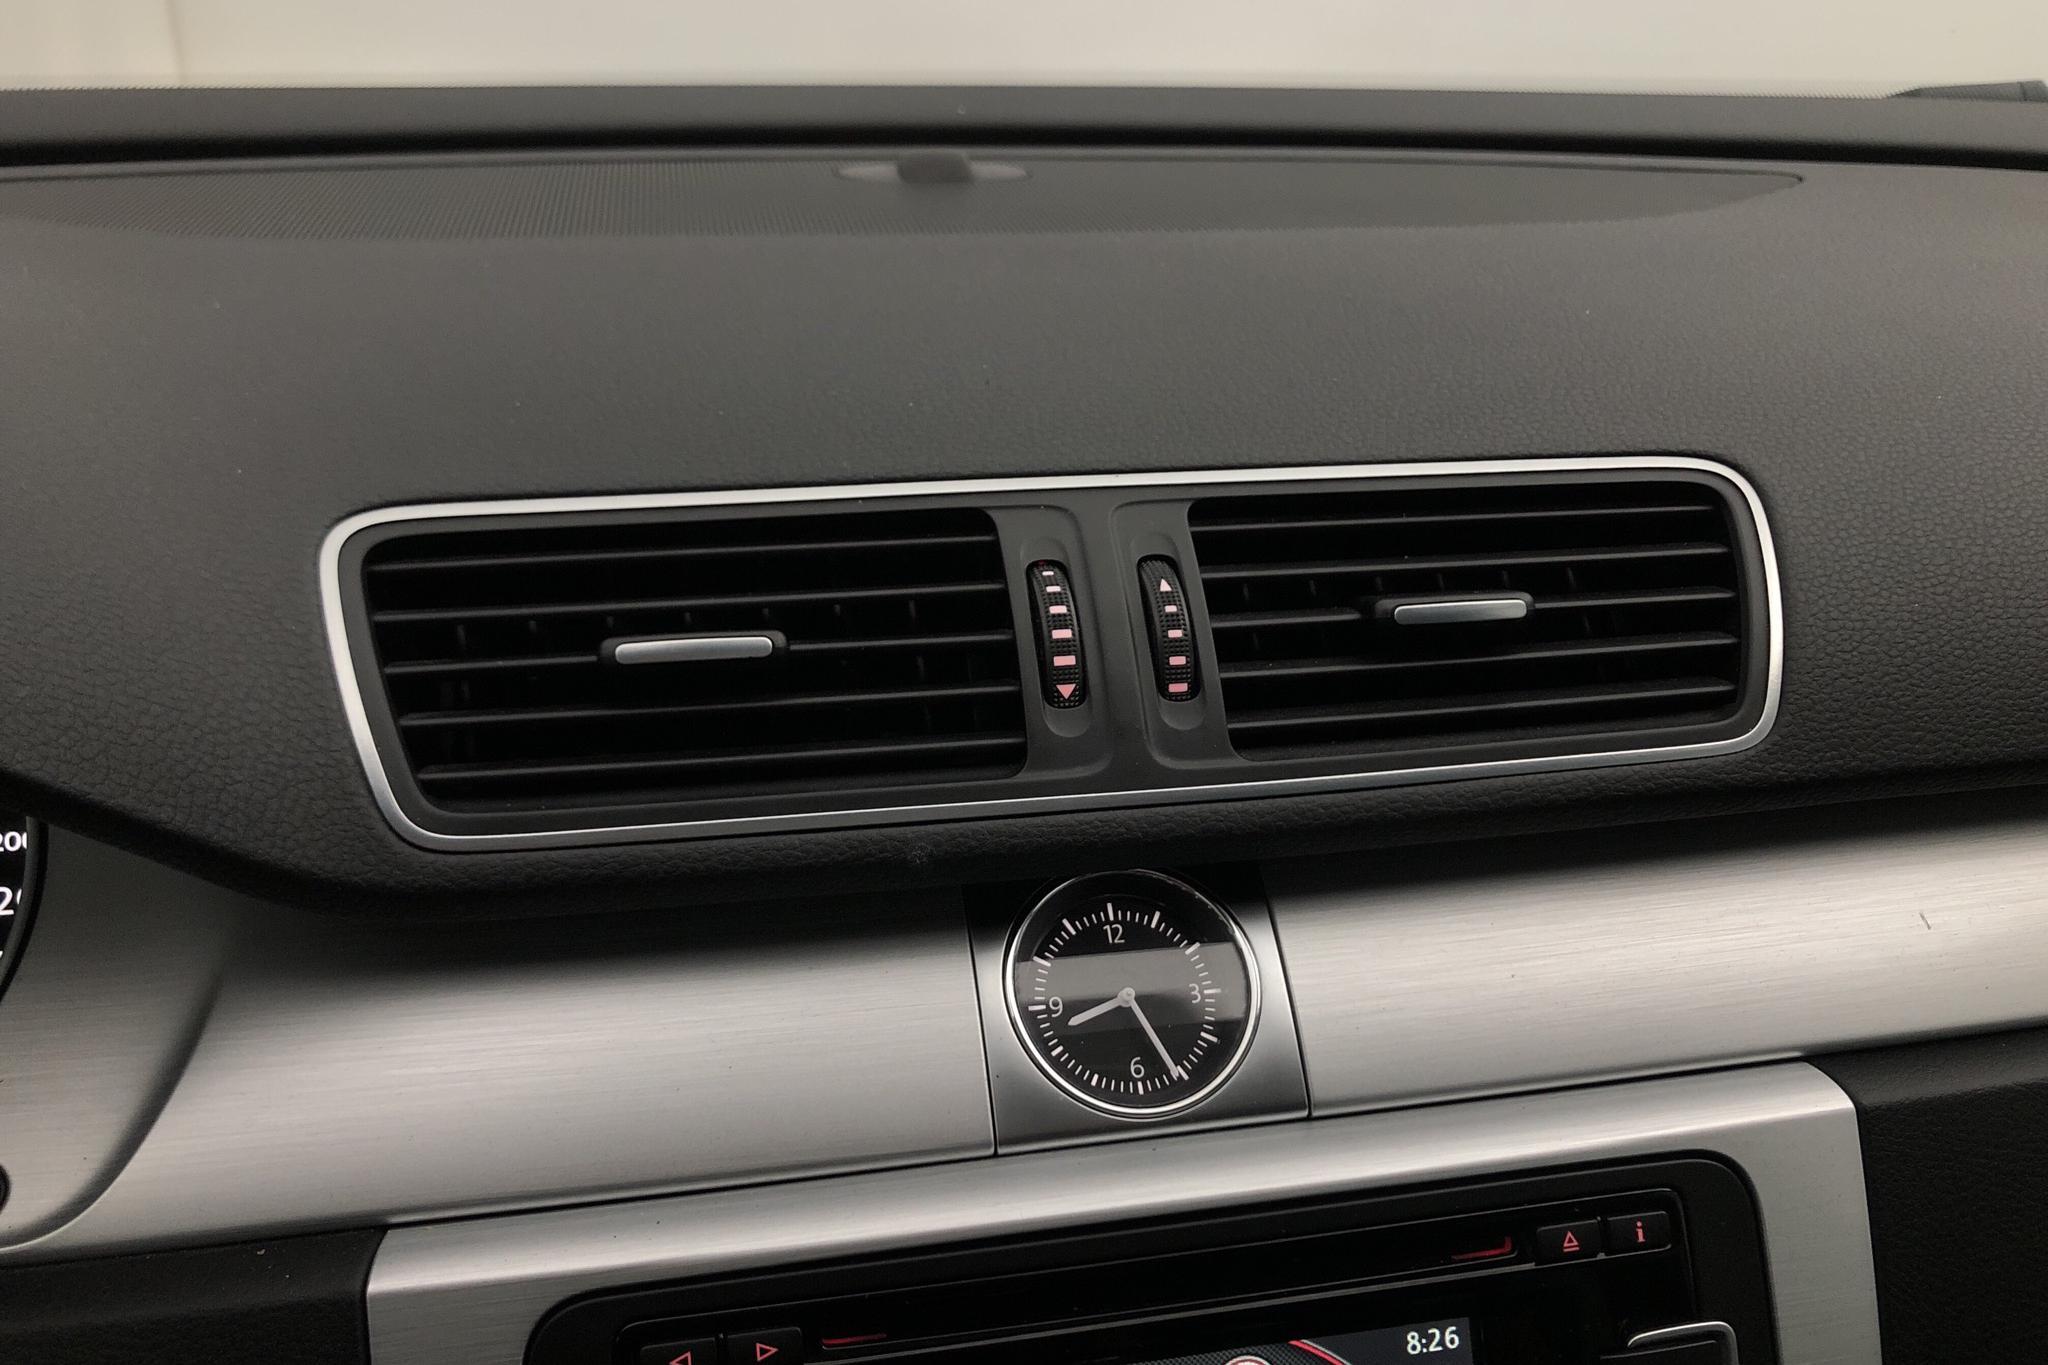 VW Passat Alltrack 2.0 TDI BlueMotion Technology 4Motion (177hk) - 186 030 km - Automatic - white - 2015